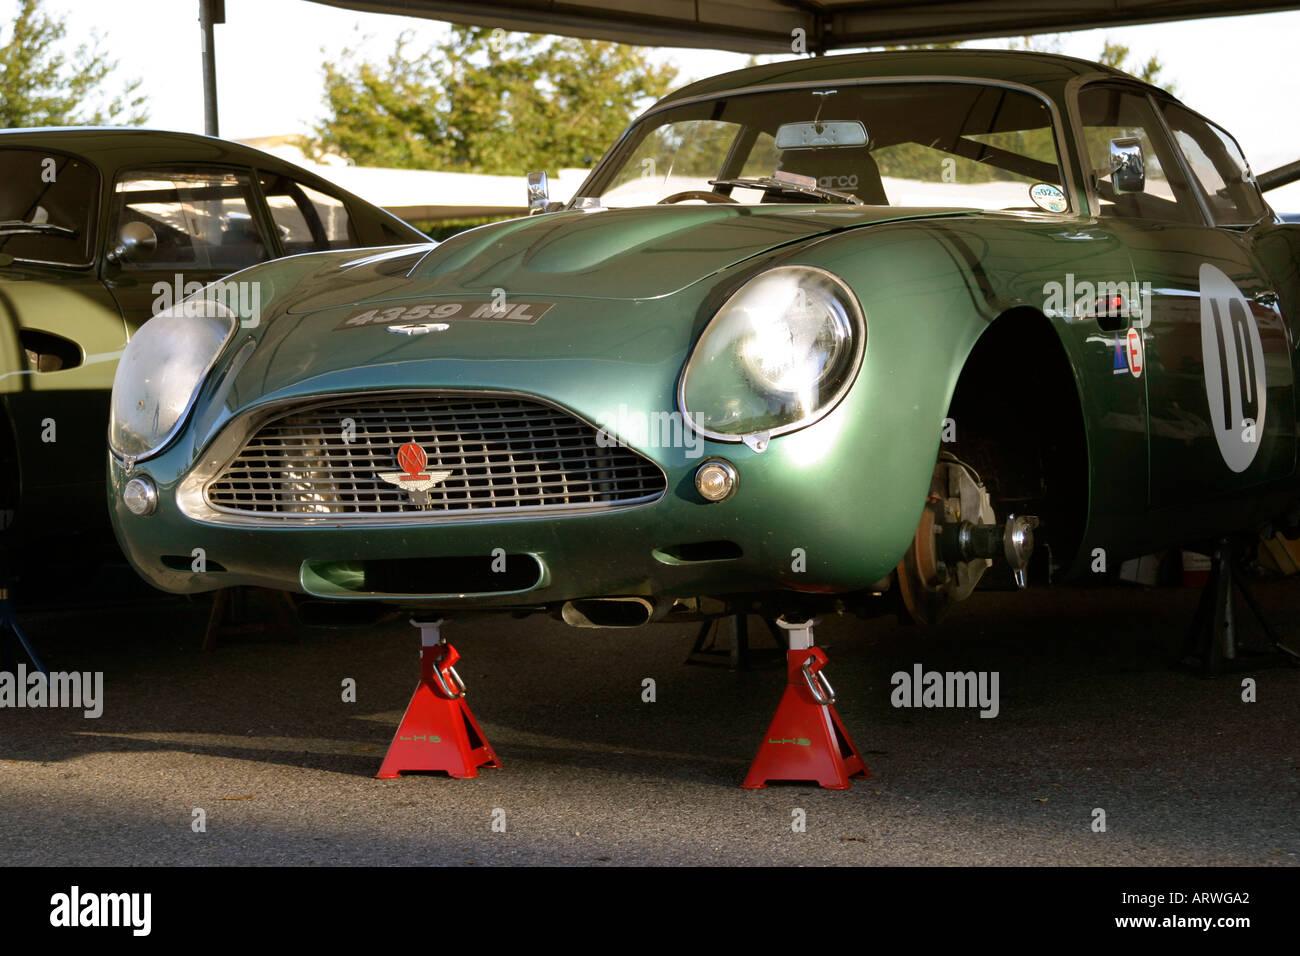 1962 Aston Martin Db4 Gt Zagato At Goodwood Revival Sussex Uk